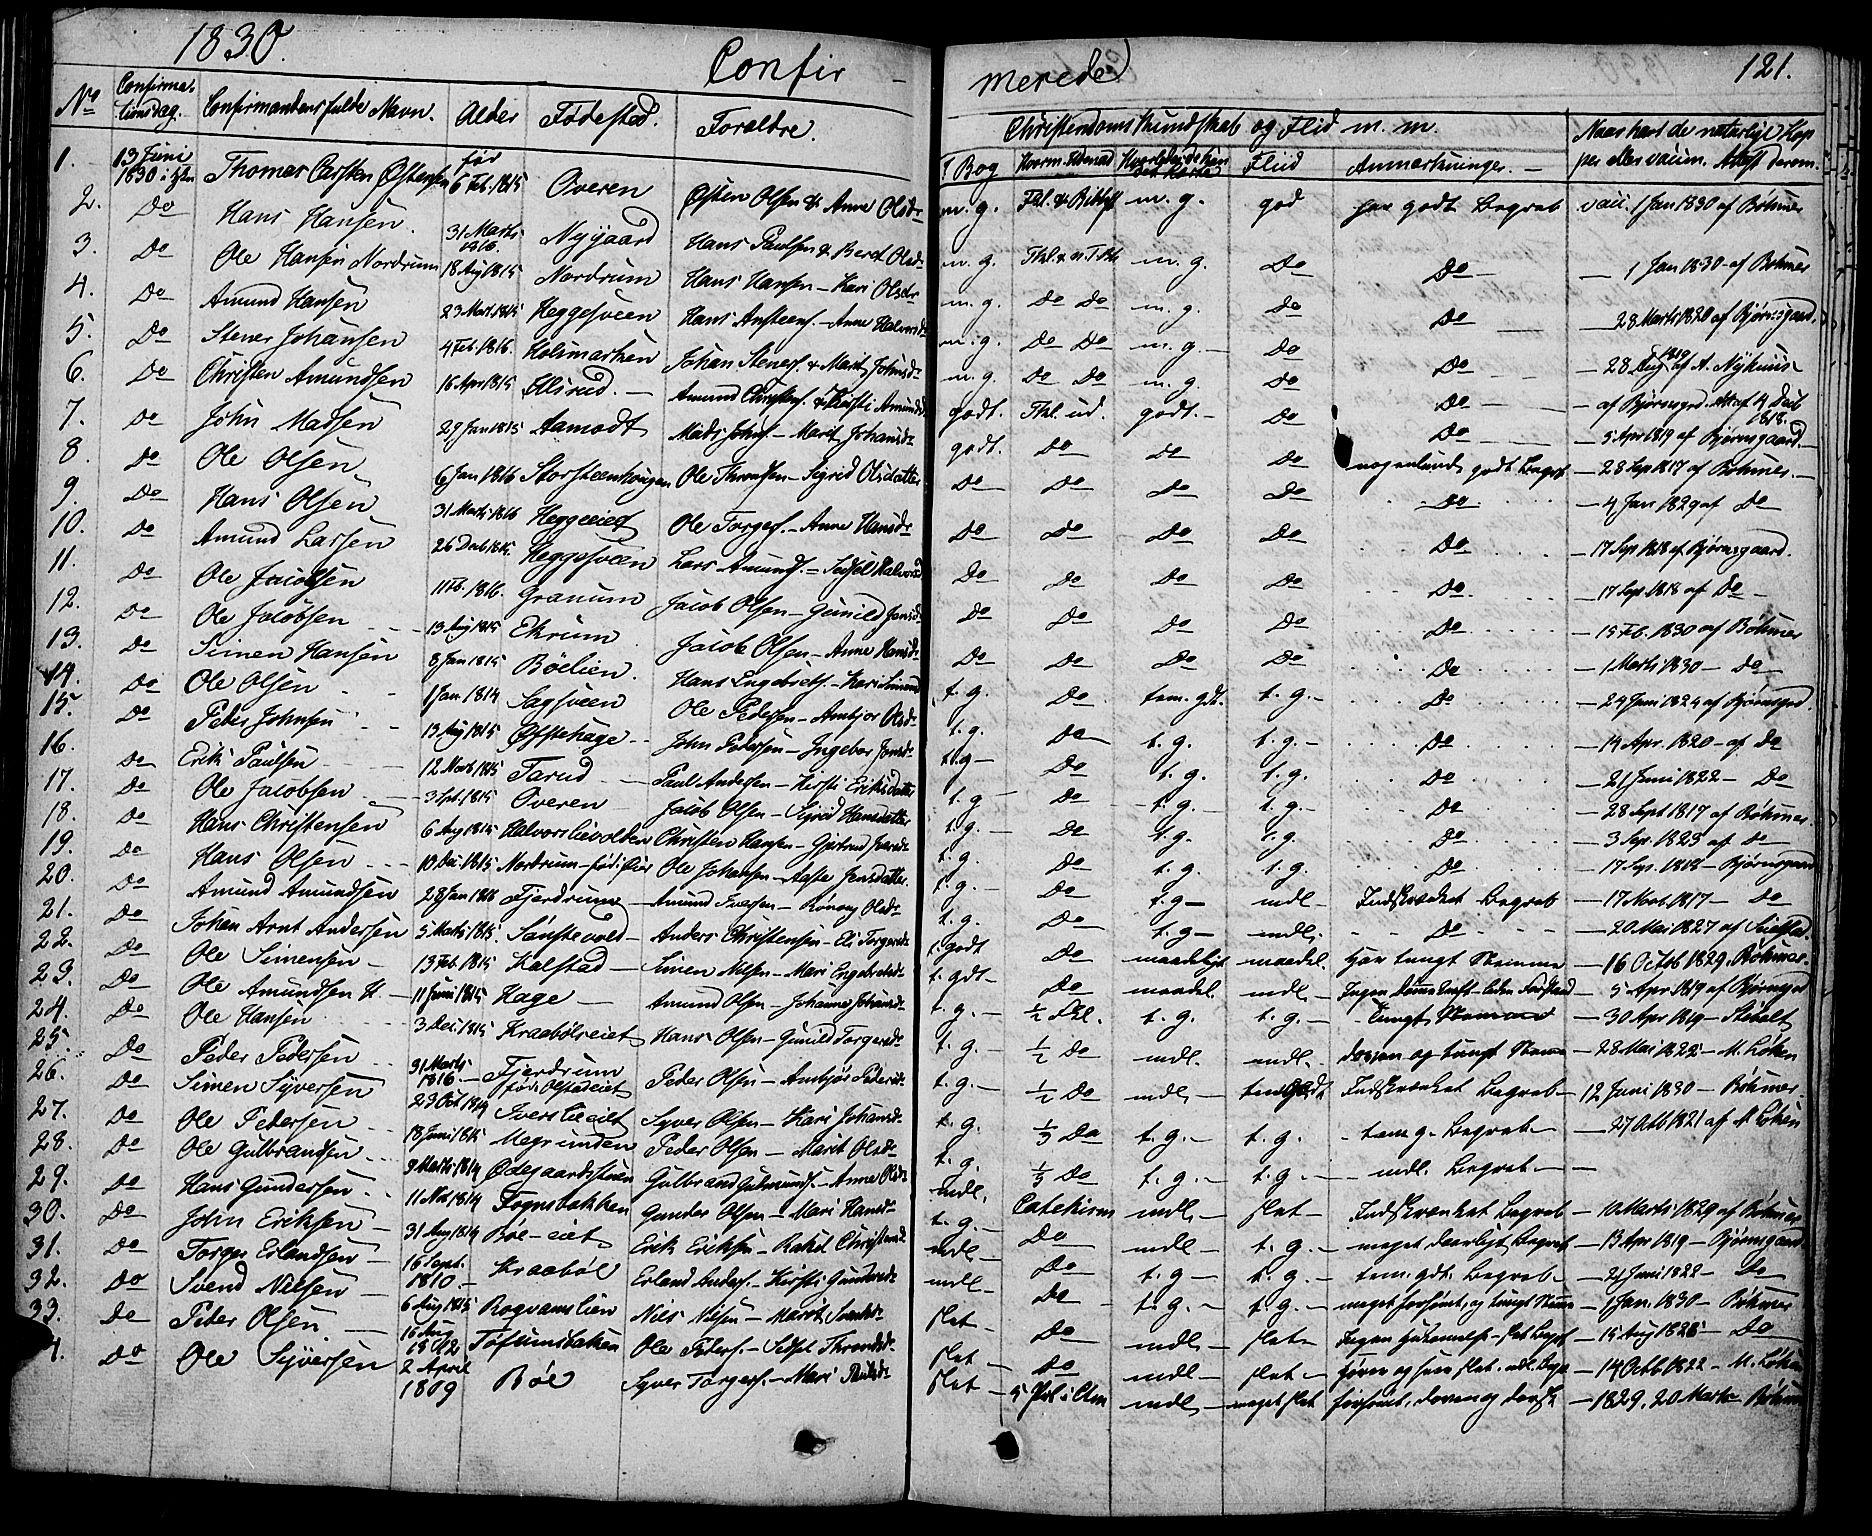 SAH, Gausdal prestekontor, Ministerialbok nr. 6, 1830-1839, s. 121